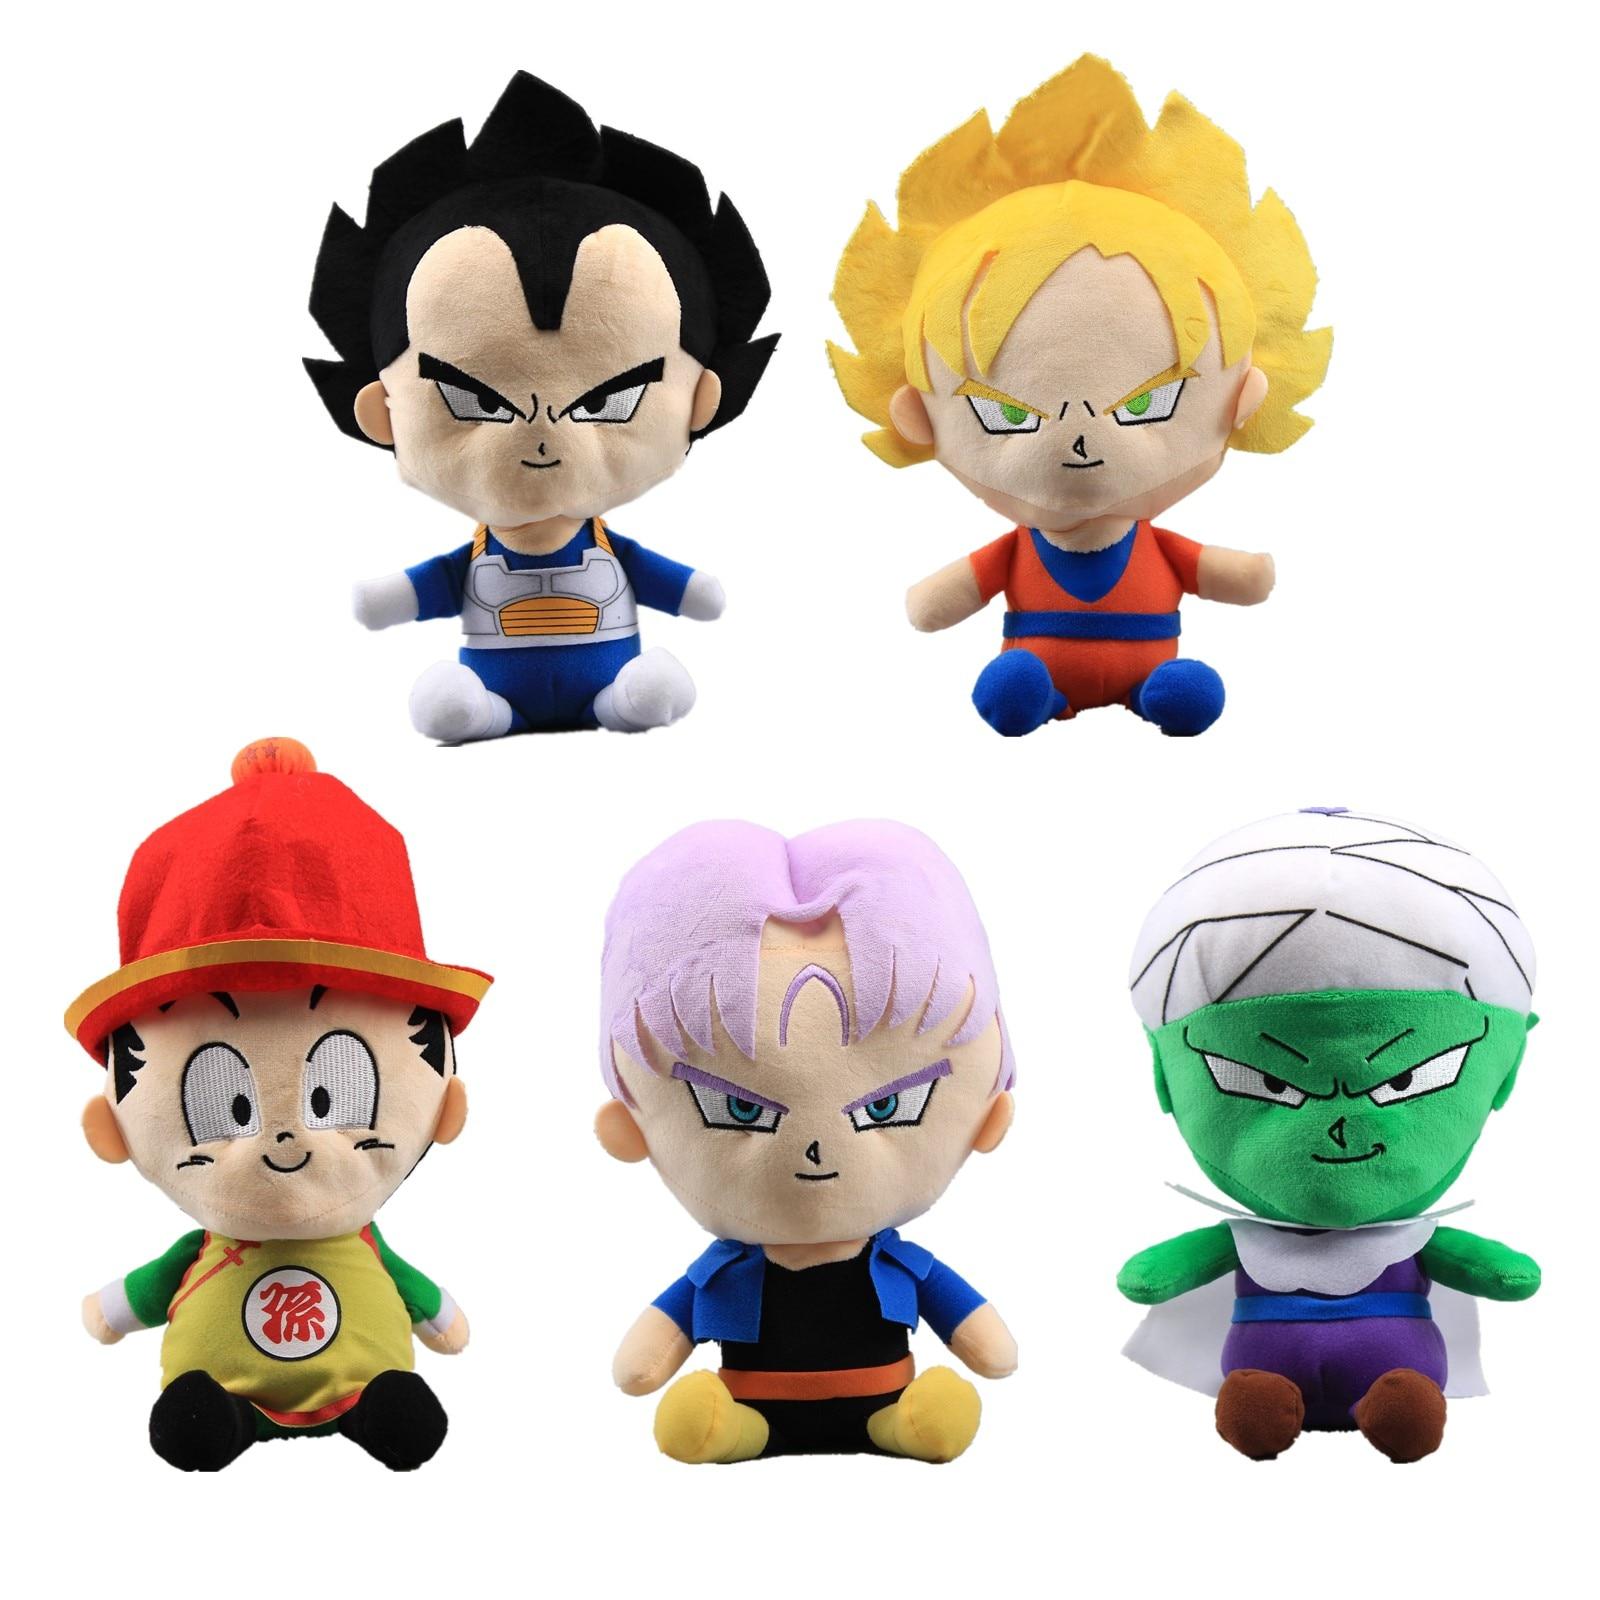 18-20cm New Dragon Ball Goku Vageta Super Saiyan God Piccolo Future Trunks Plush Dolls Keychain Baby Kids Birthday Gift